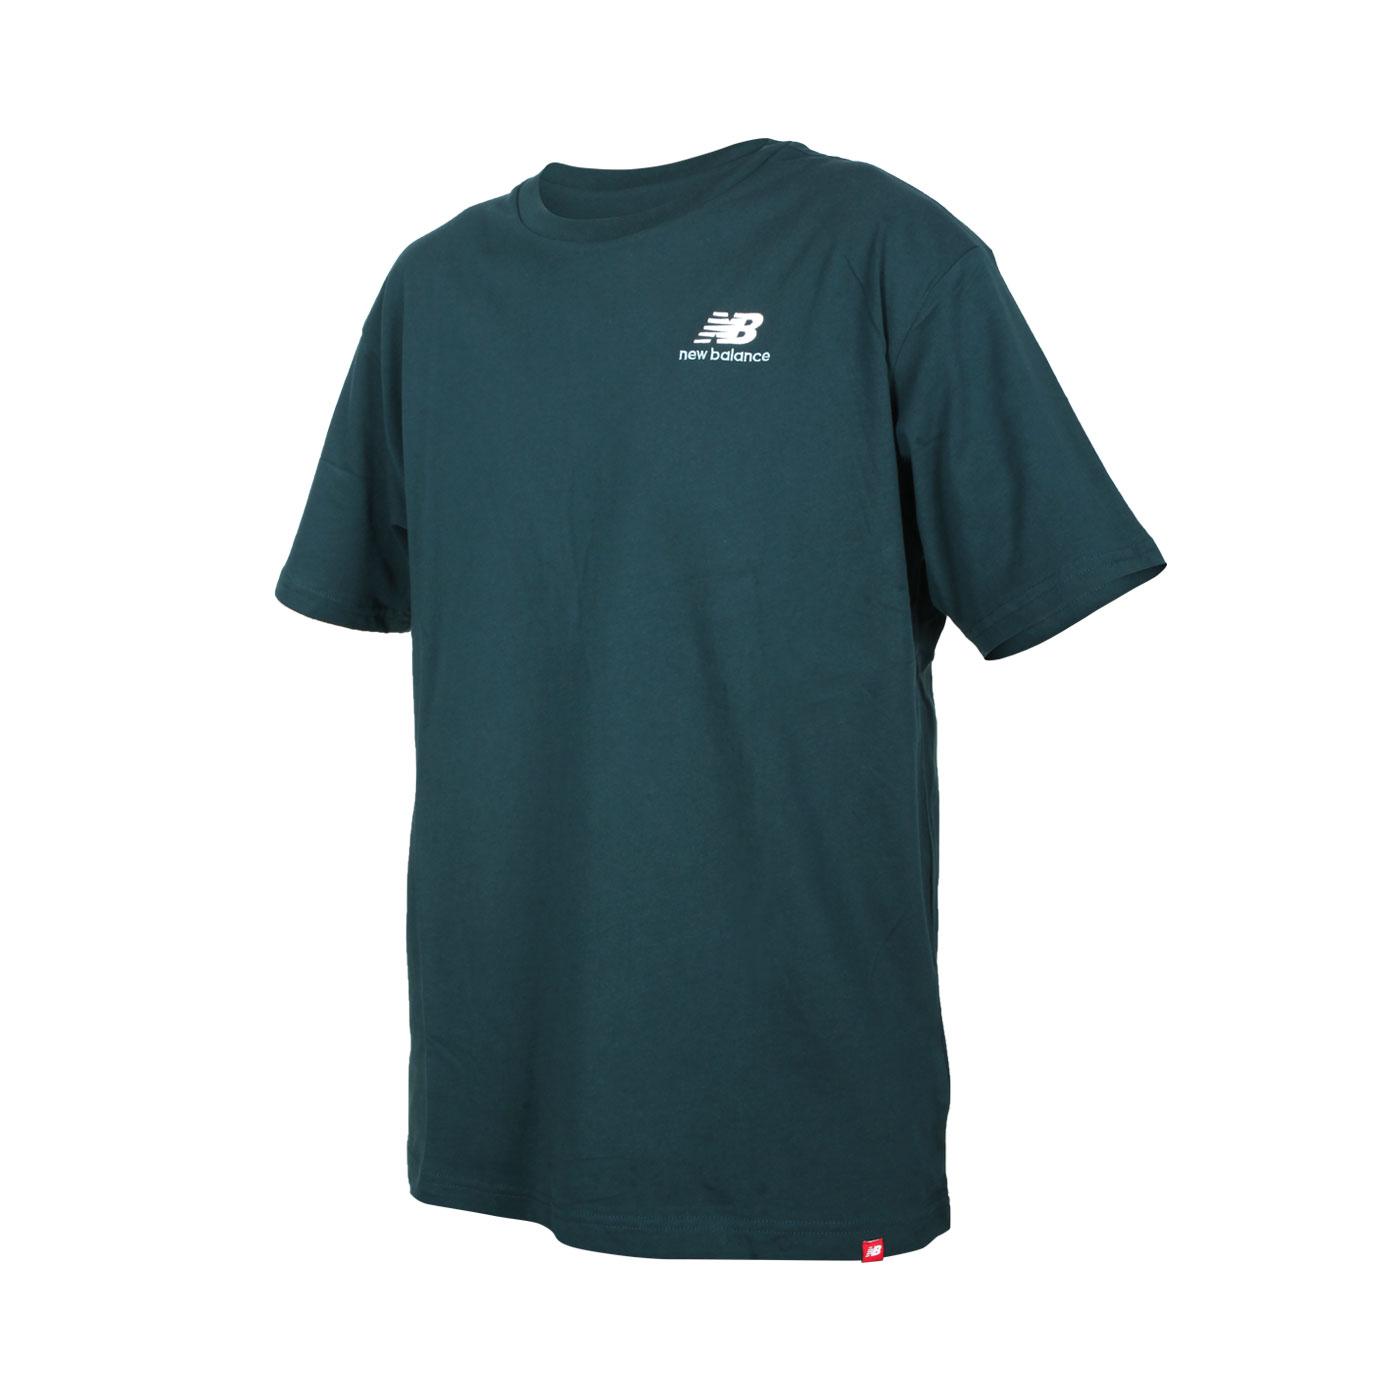 NEW BALANCE 男款短袖T恤 MT11592TKK - 鴨綠白